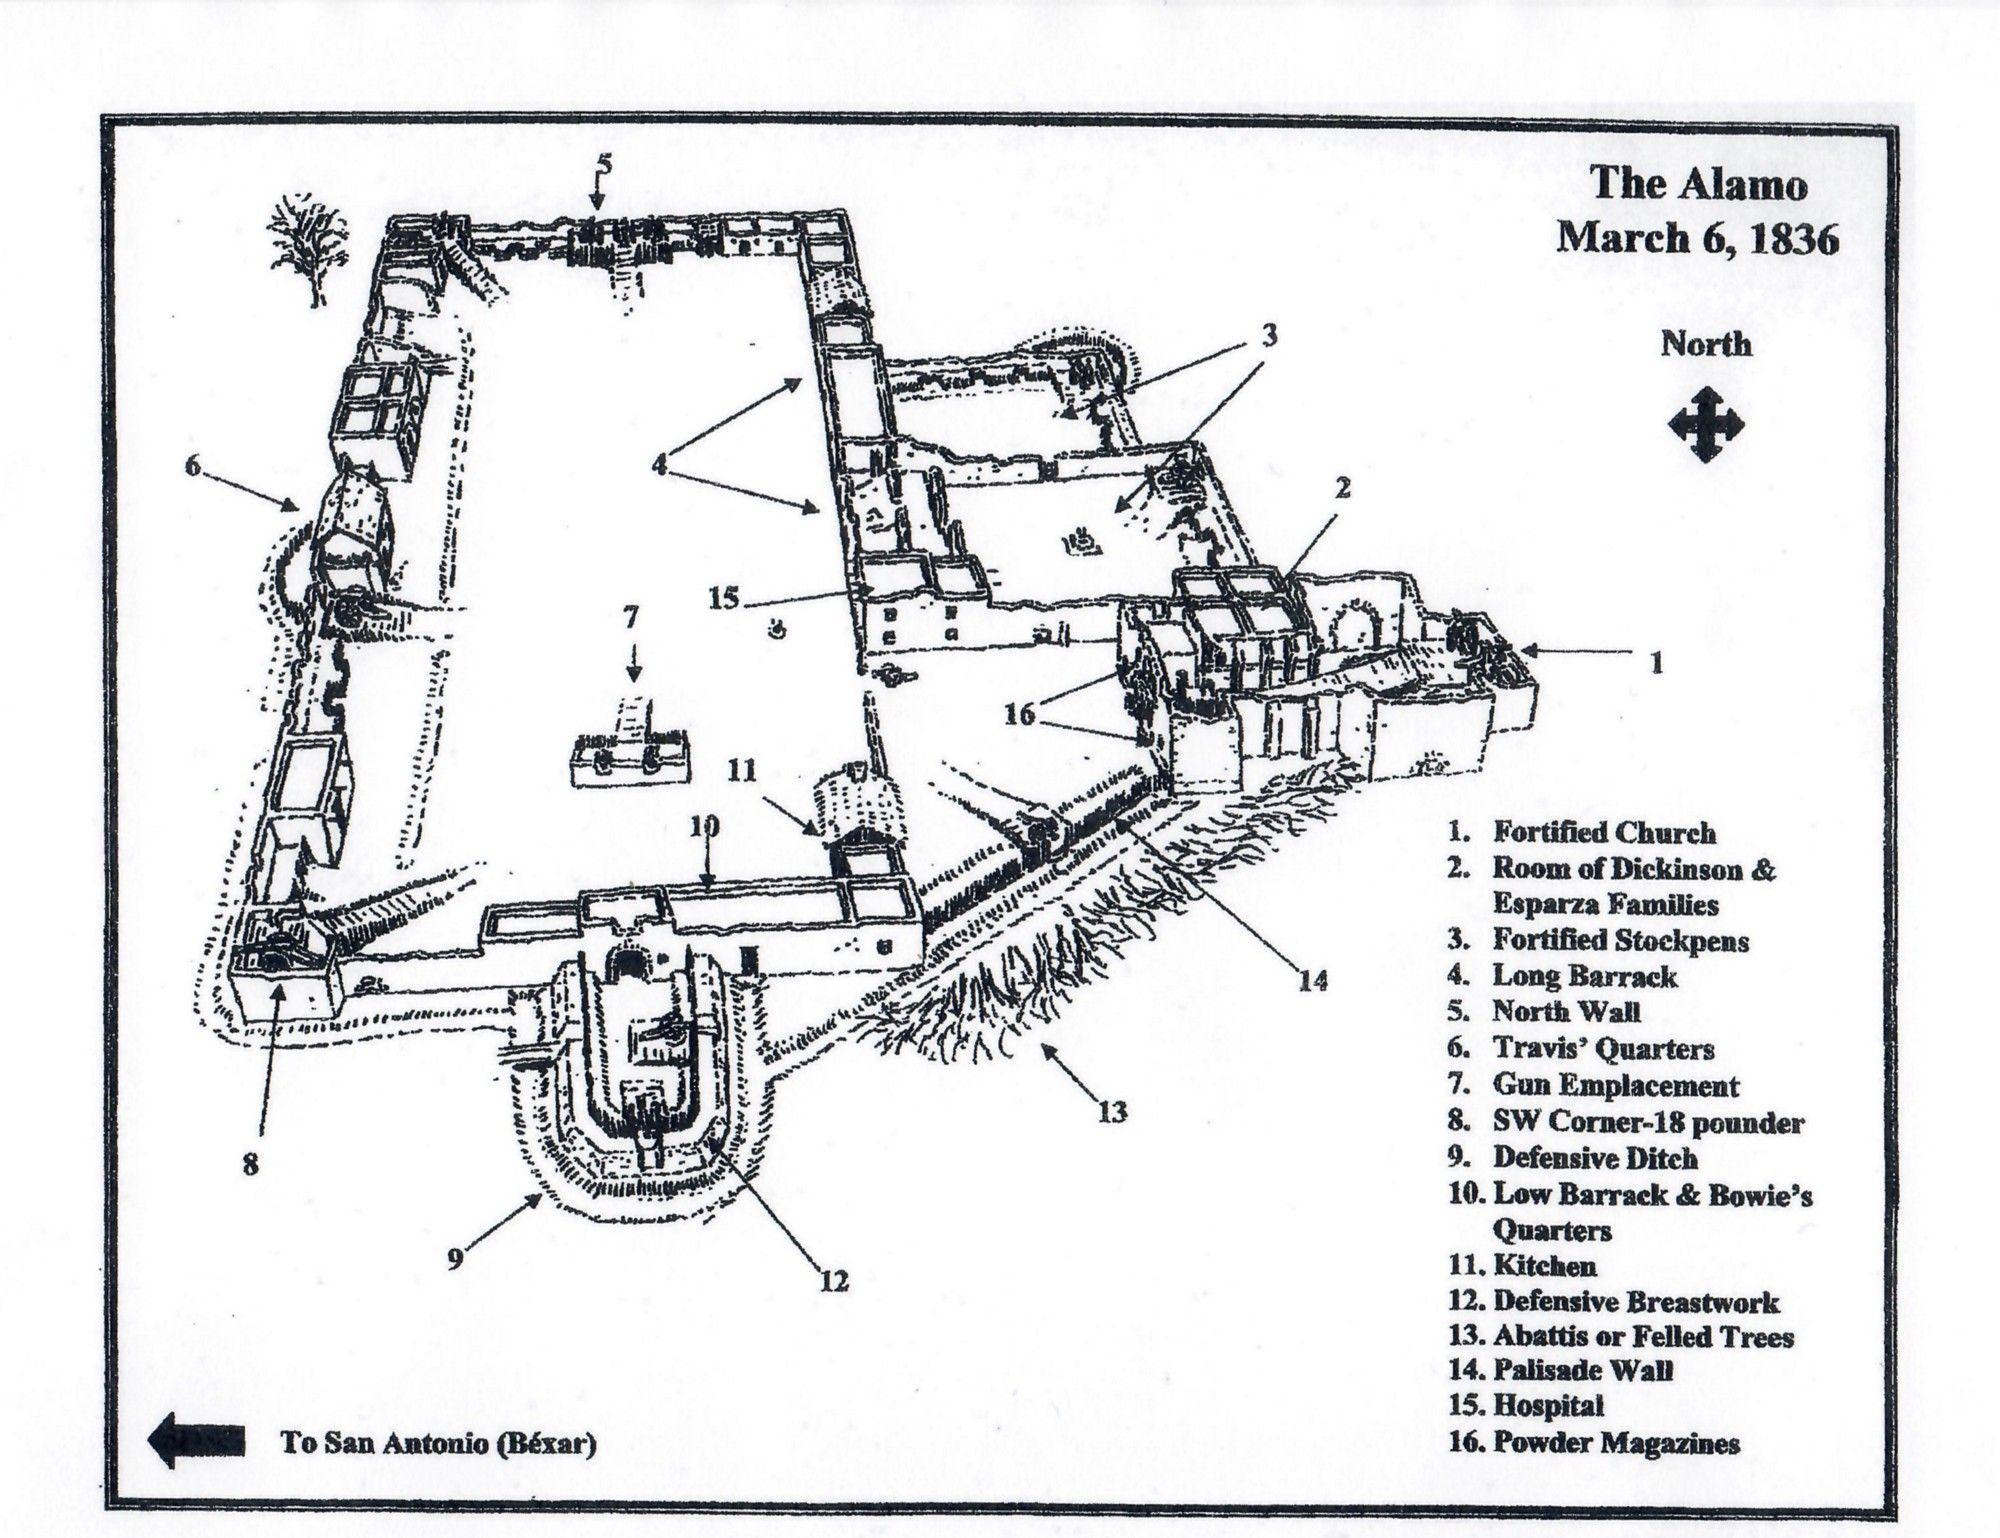 Fortress Alamo